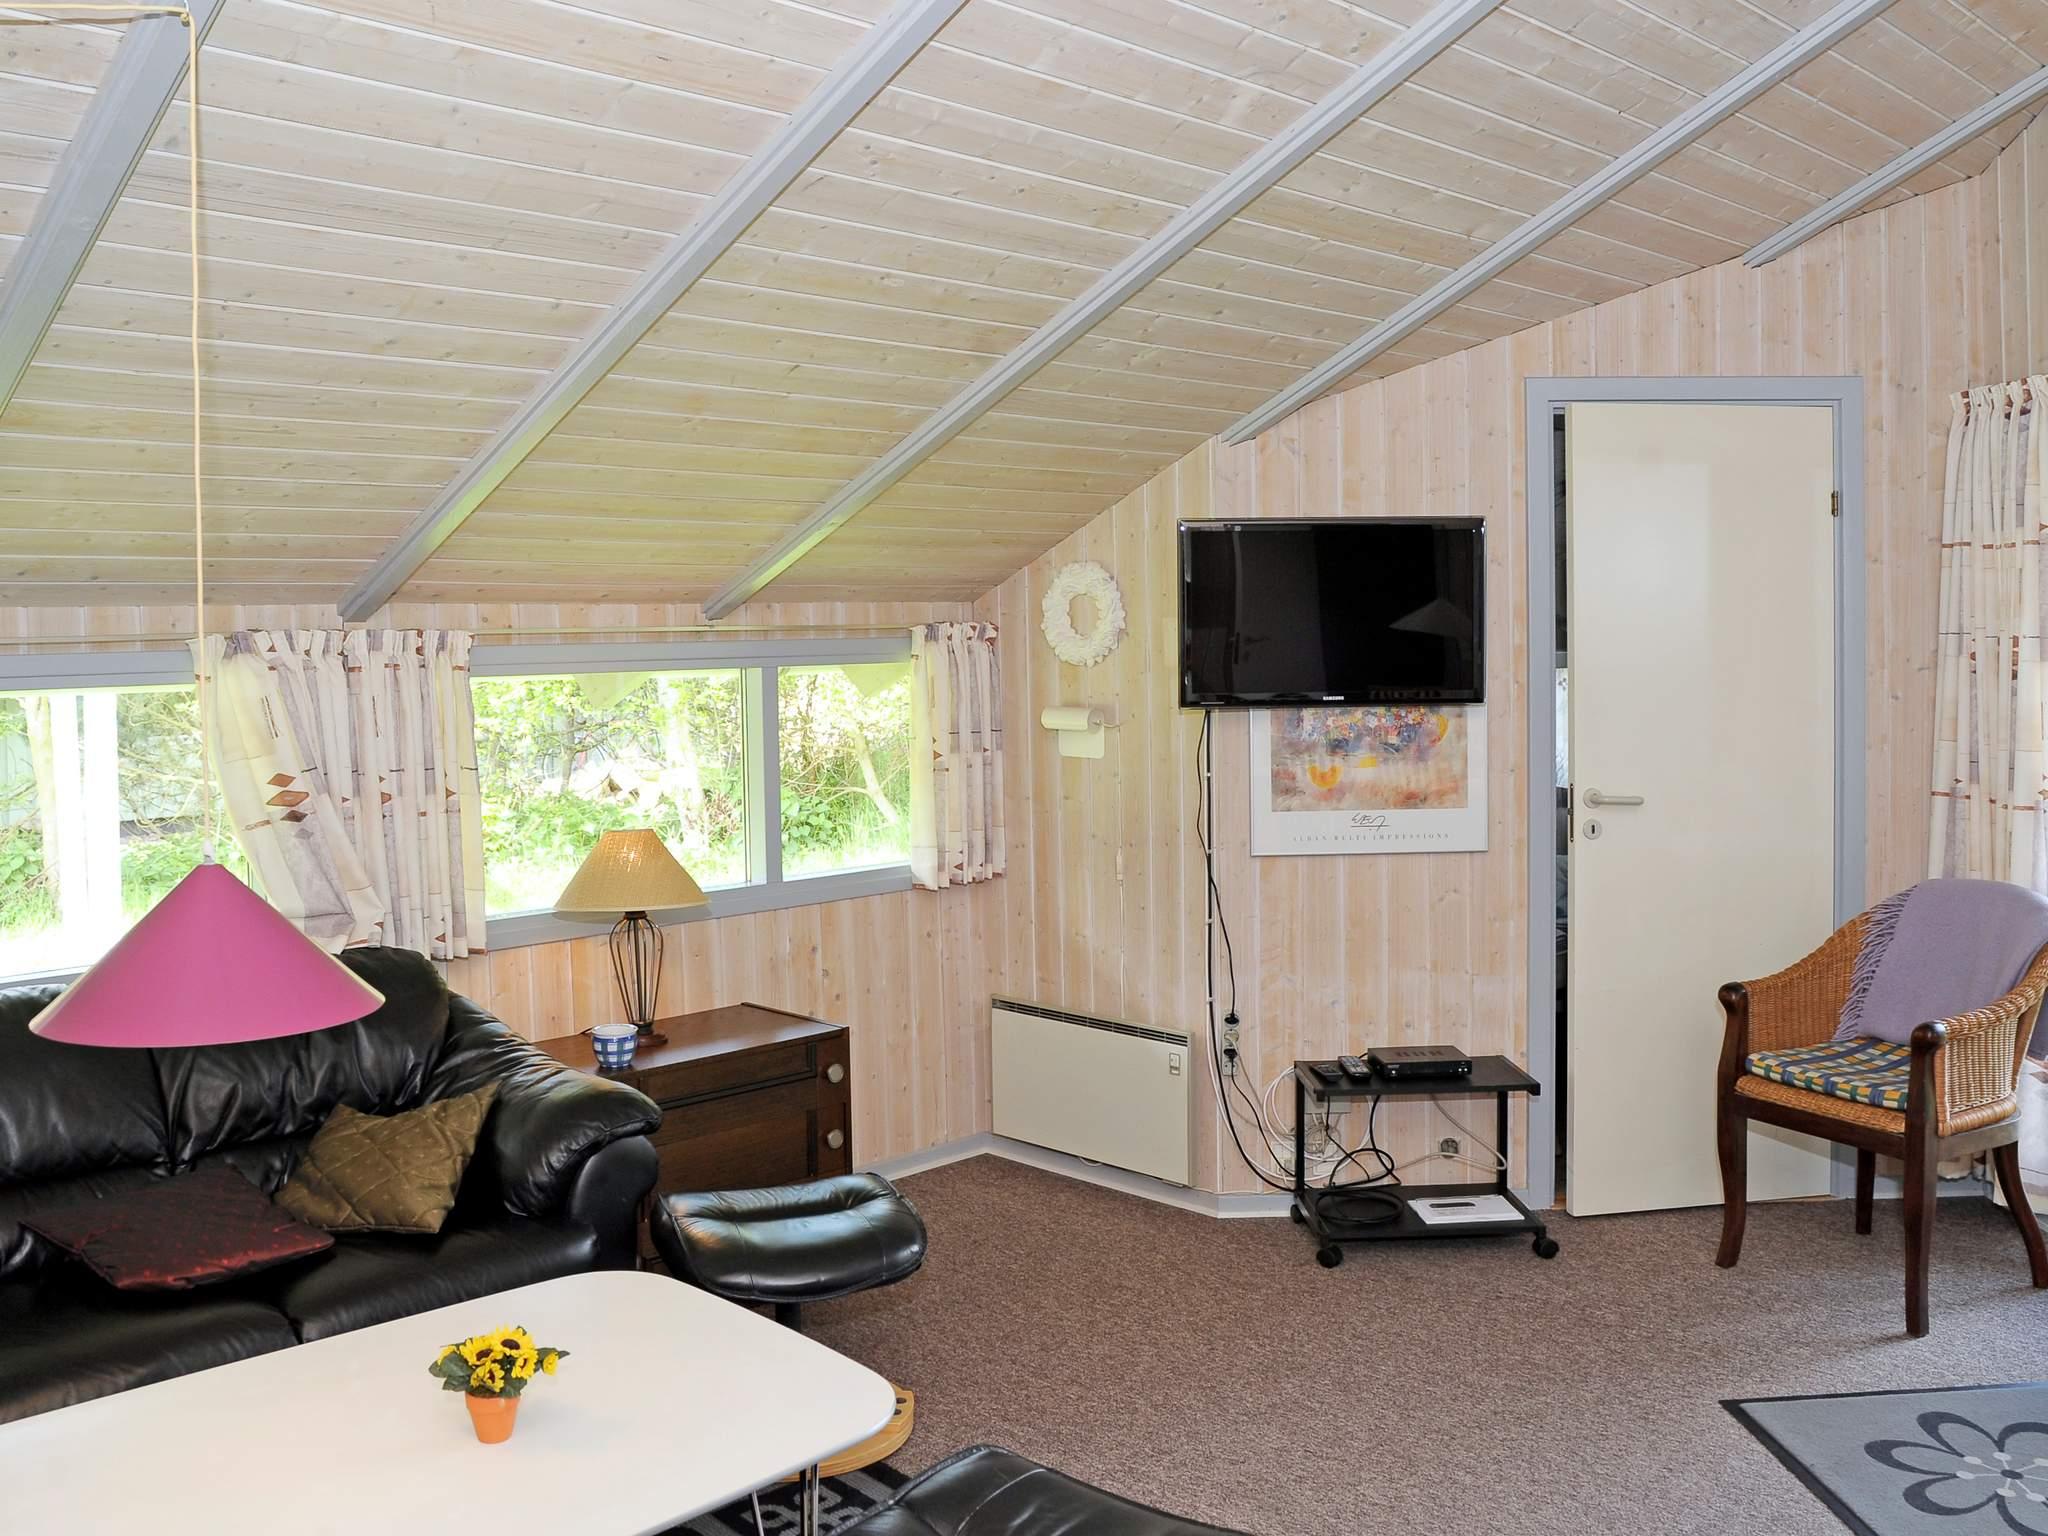 Ferienhaus Ristinge (93203), Ristinge, , Langeland, Dänemark, Bild 31